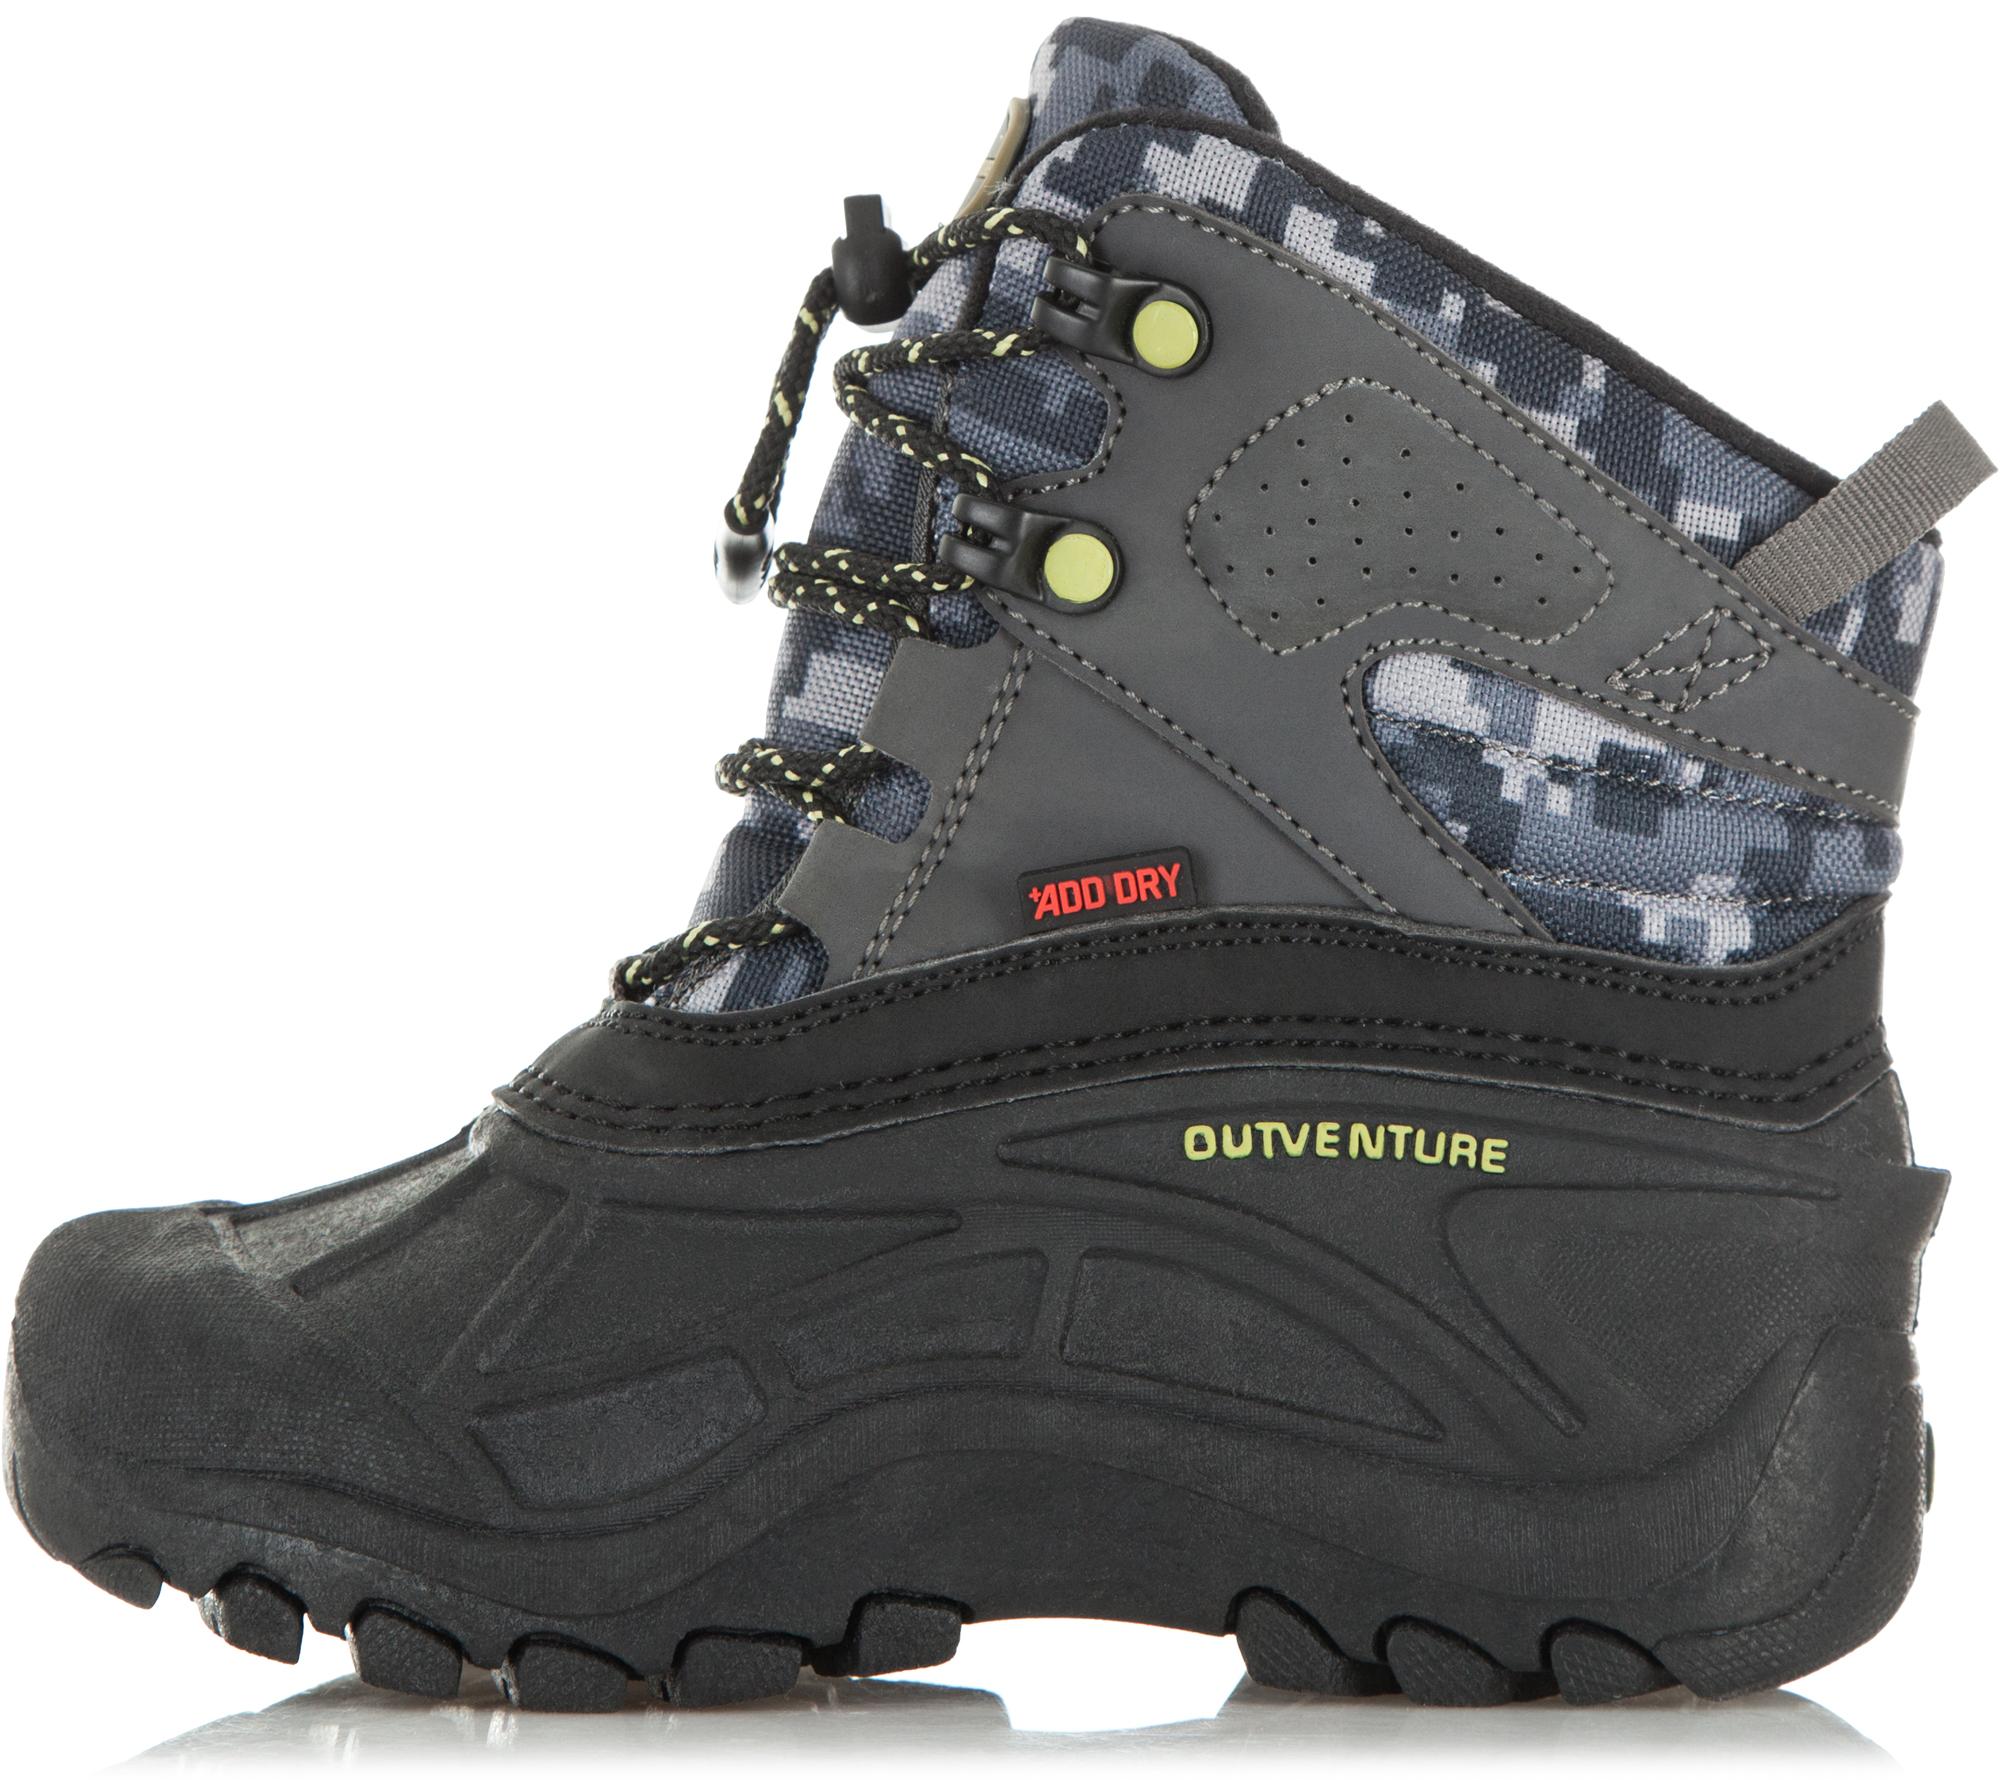 Outventure Сапоги утепленные для мальчиков Outventure Rime, размер 30 outventure ботинки утепленные для мальчиков outventure